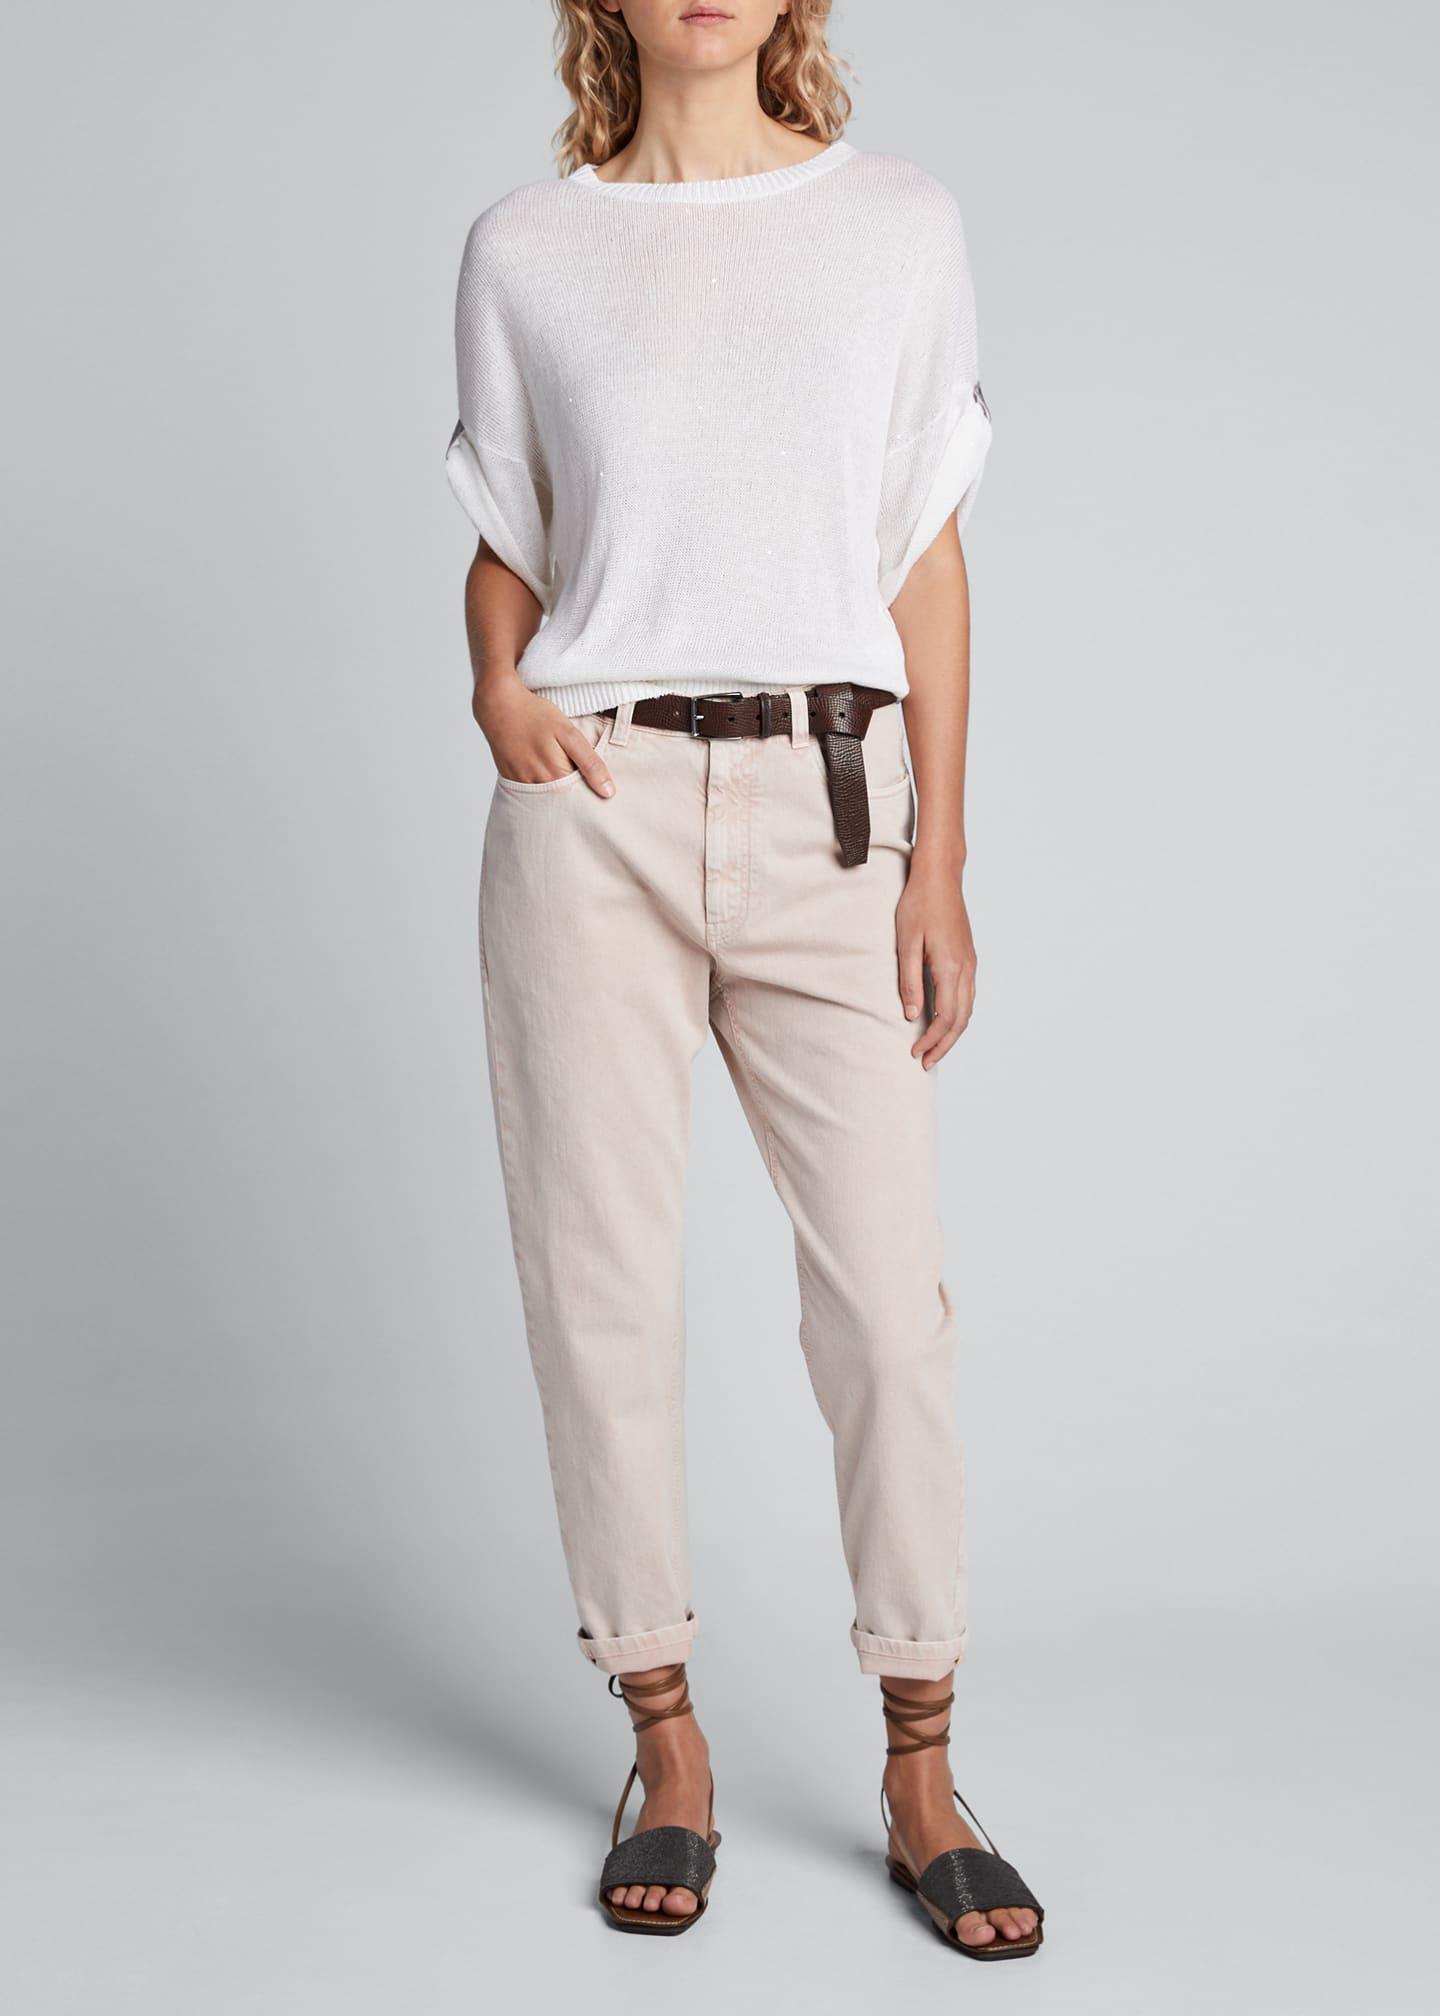 Brunello Cucinelli Linen-Silk Sequined Crewneck Sweater, White